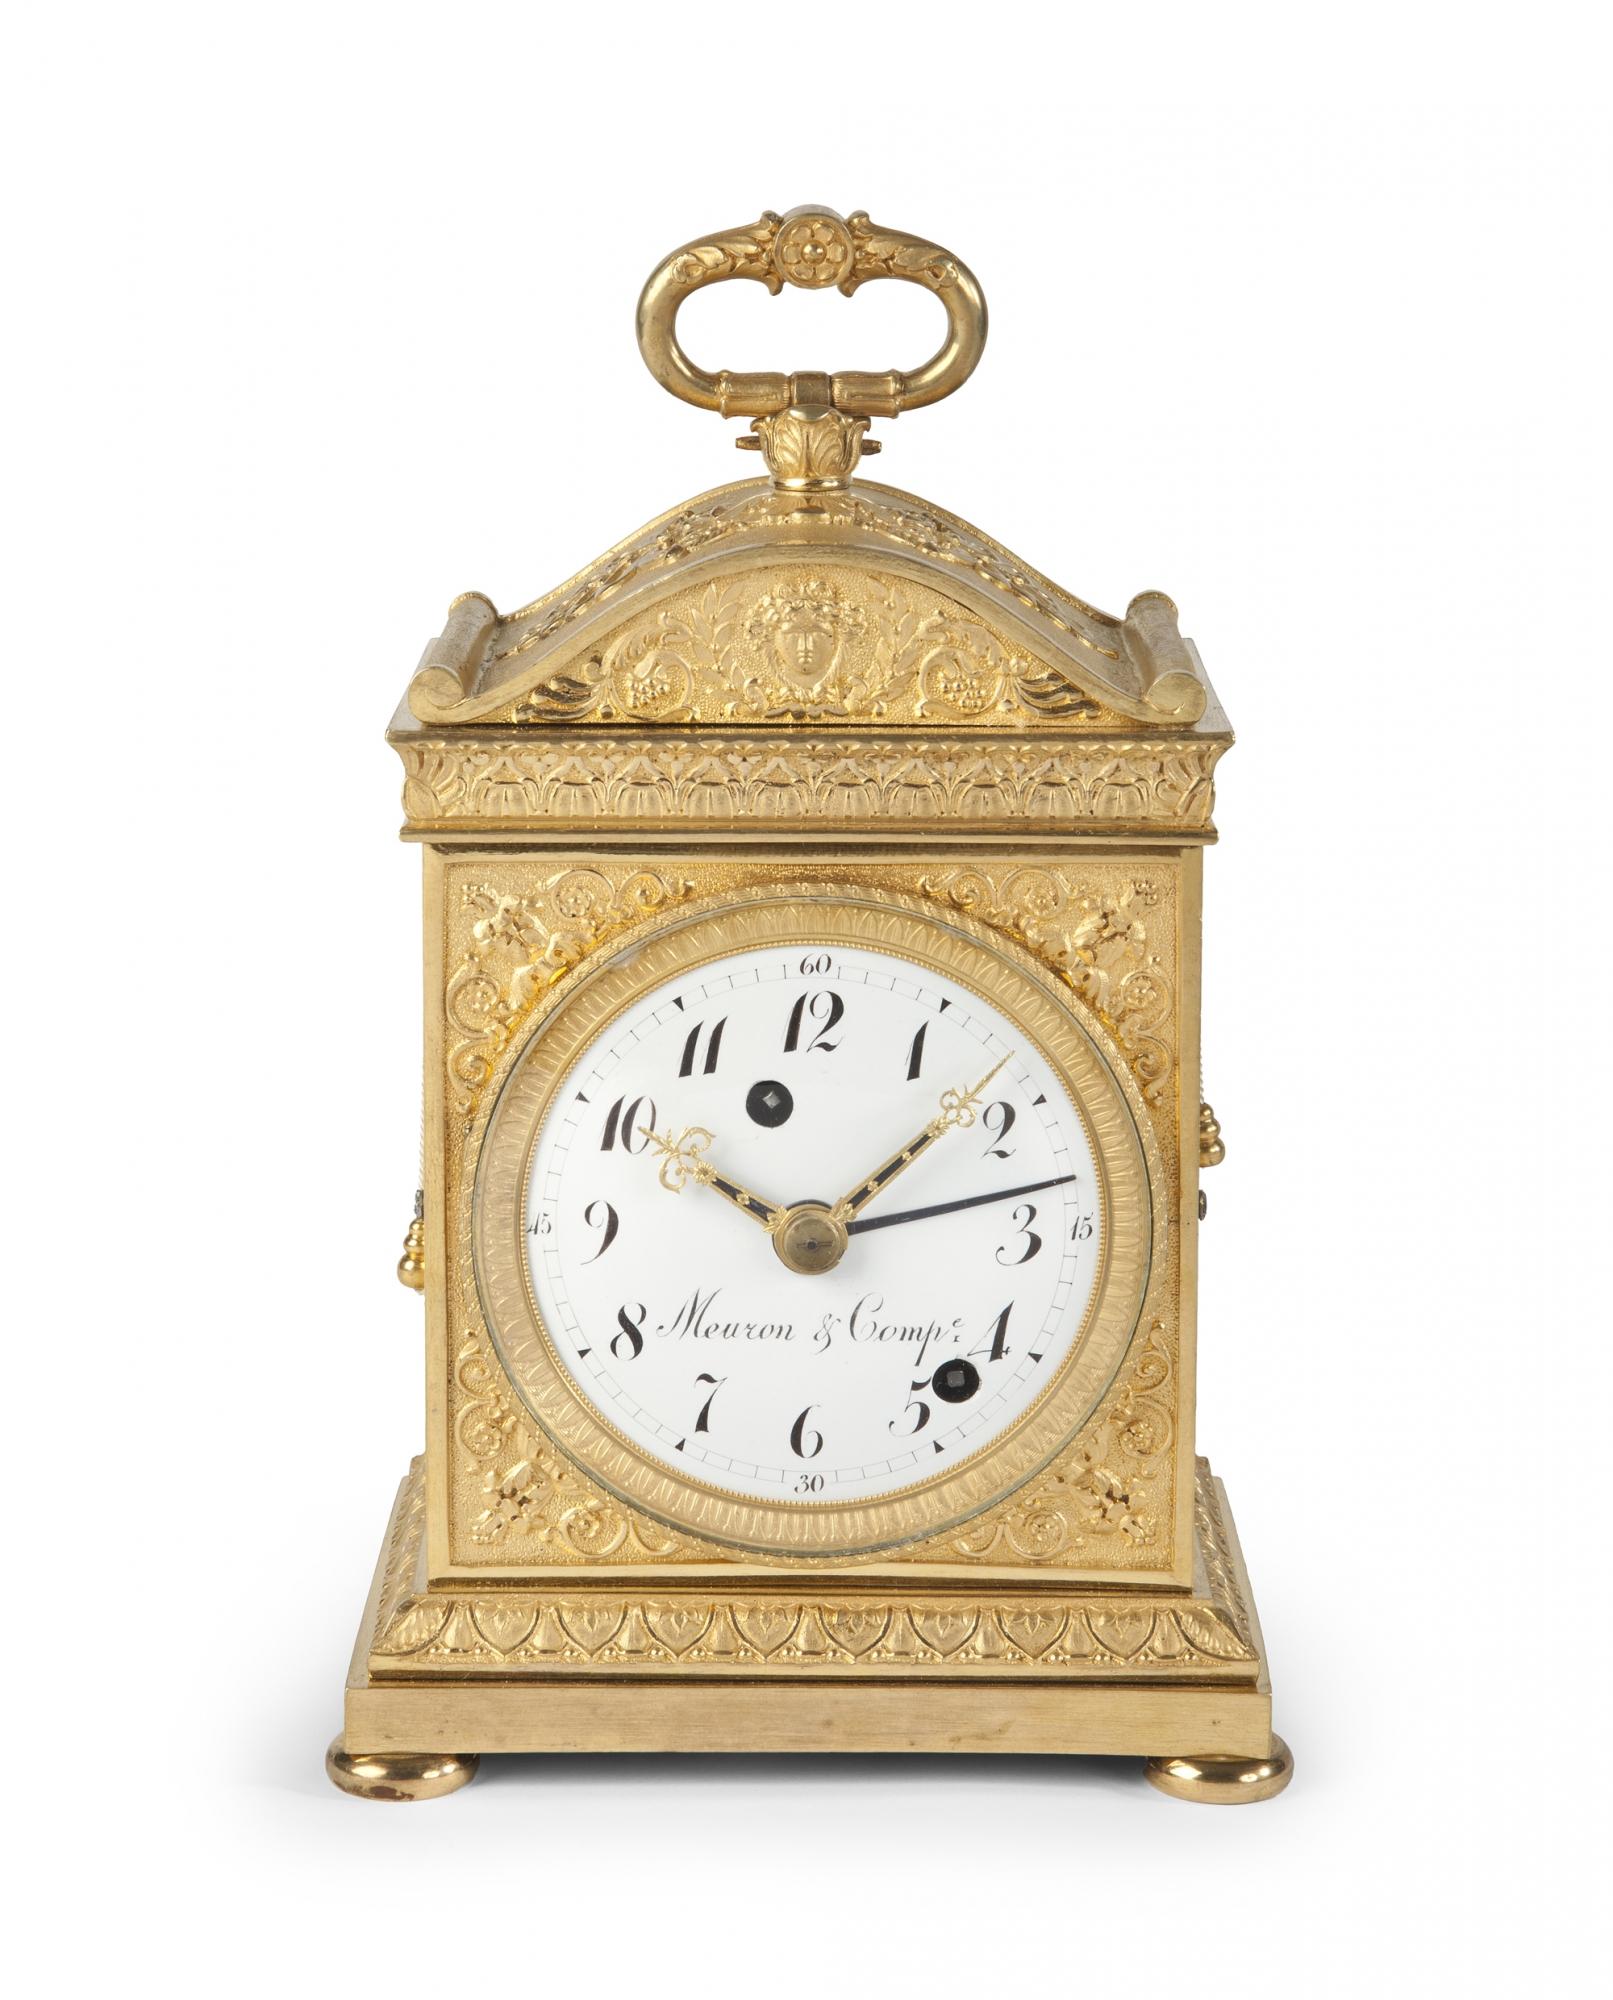 a swiss ormolu 39 pendule d 39 officier 39 with grande sonnerie by meuron compagnie circa 1810. Black Bedroom Furniture Sets. Home Design Ideas